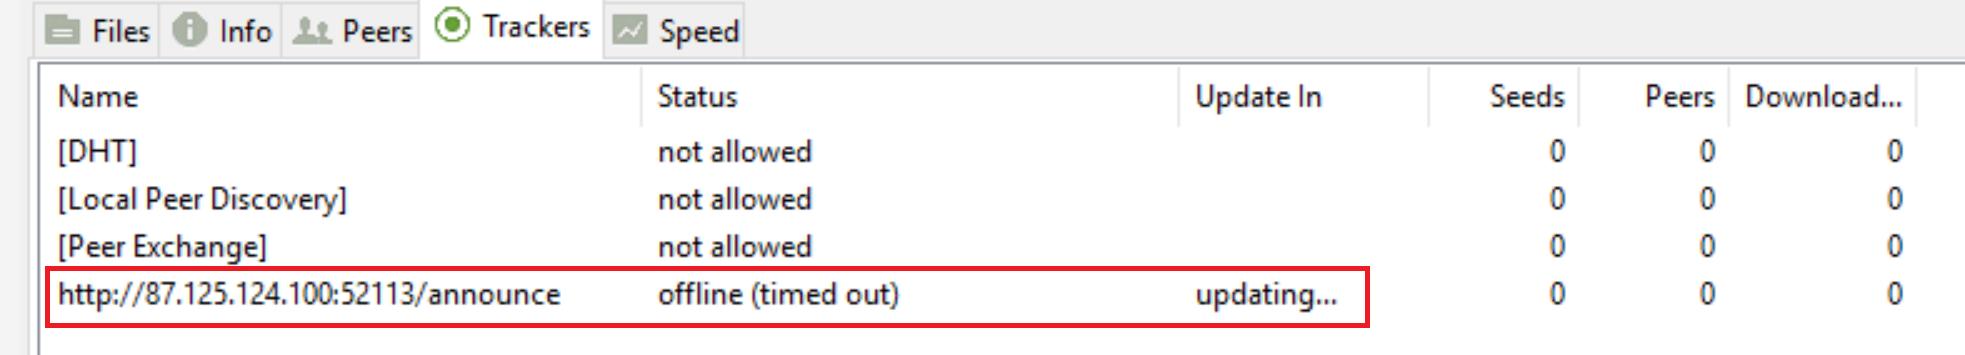 utorrent tracker function don't work - Troubleshooting - µTorrent